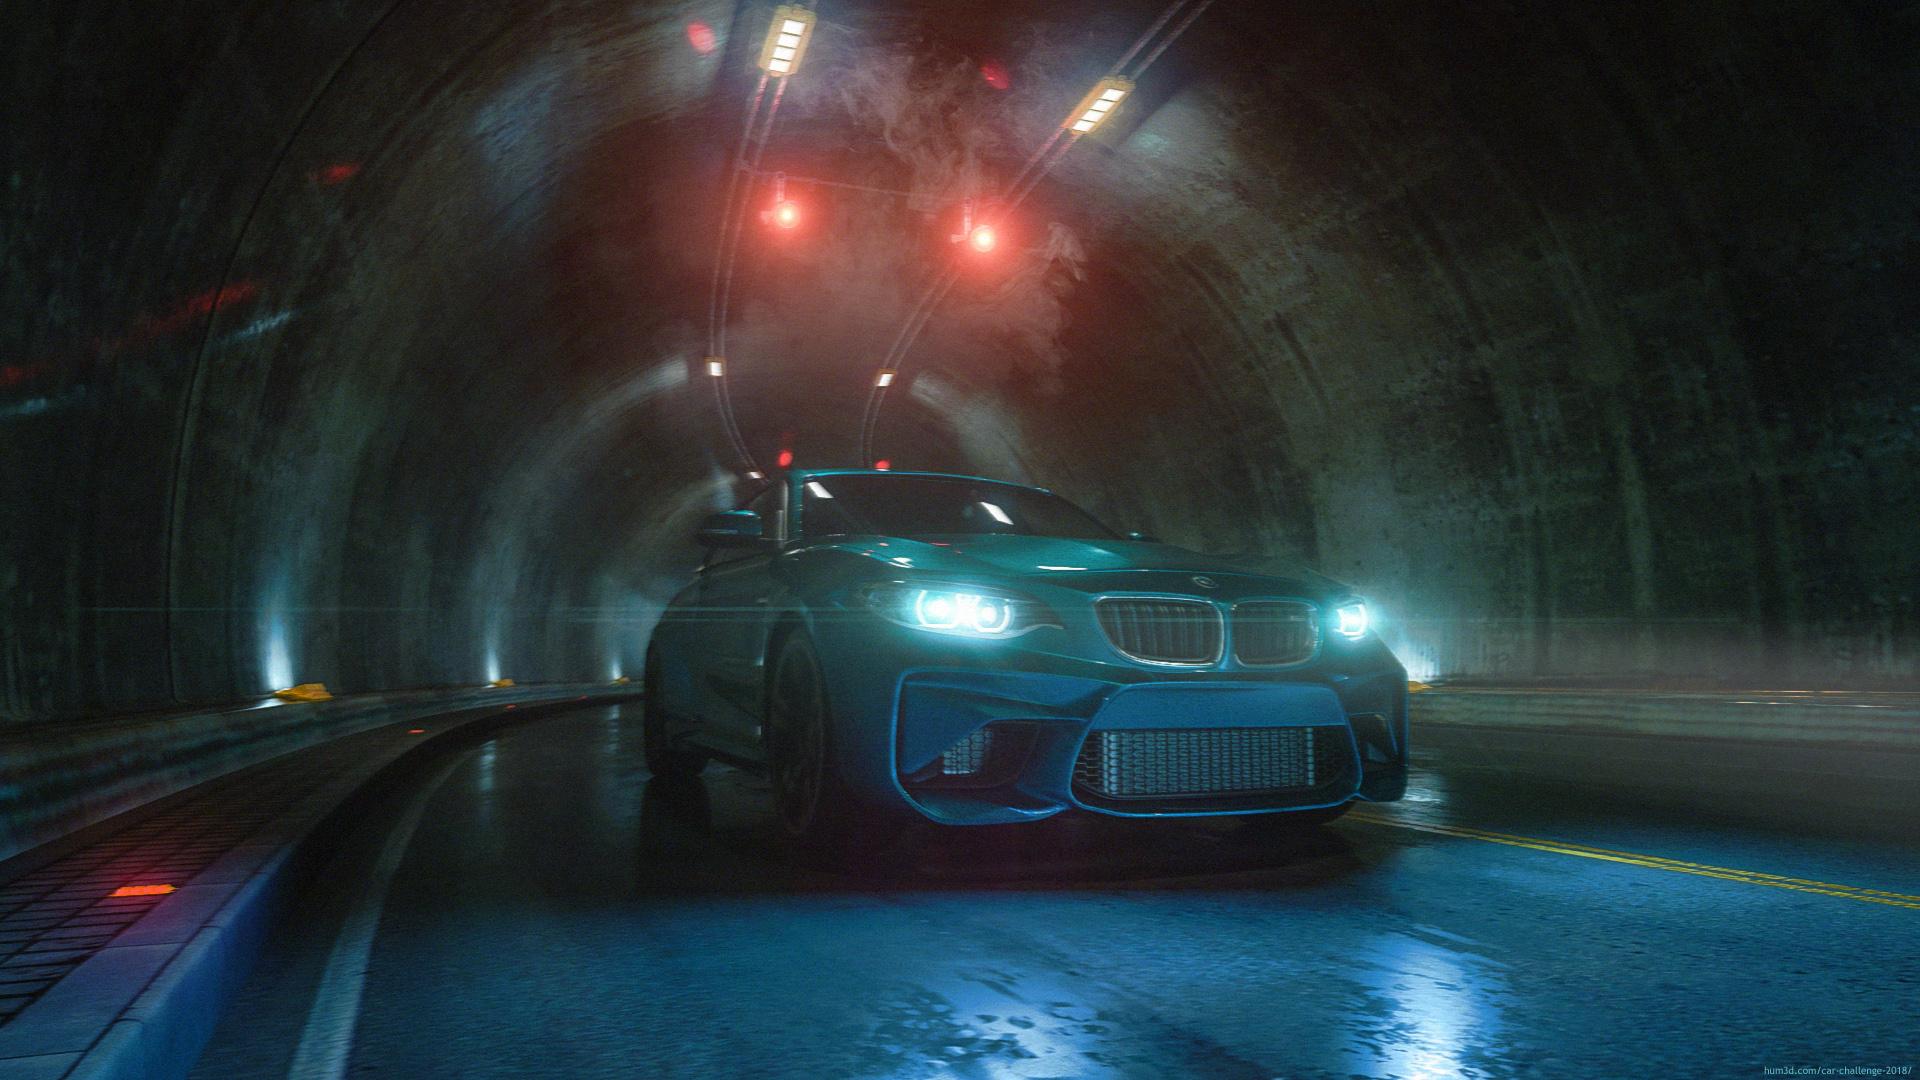 Through the tunnel 3d art